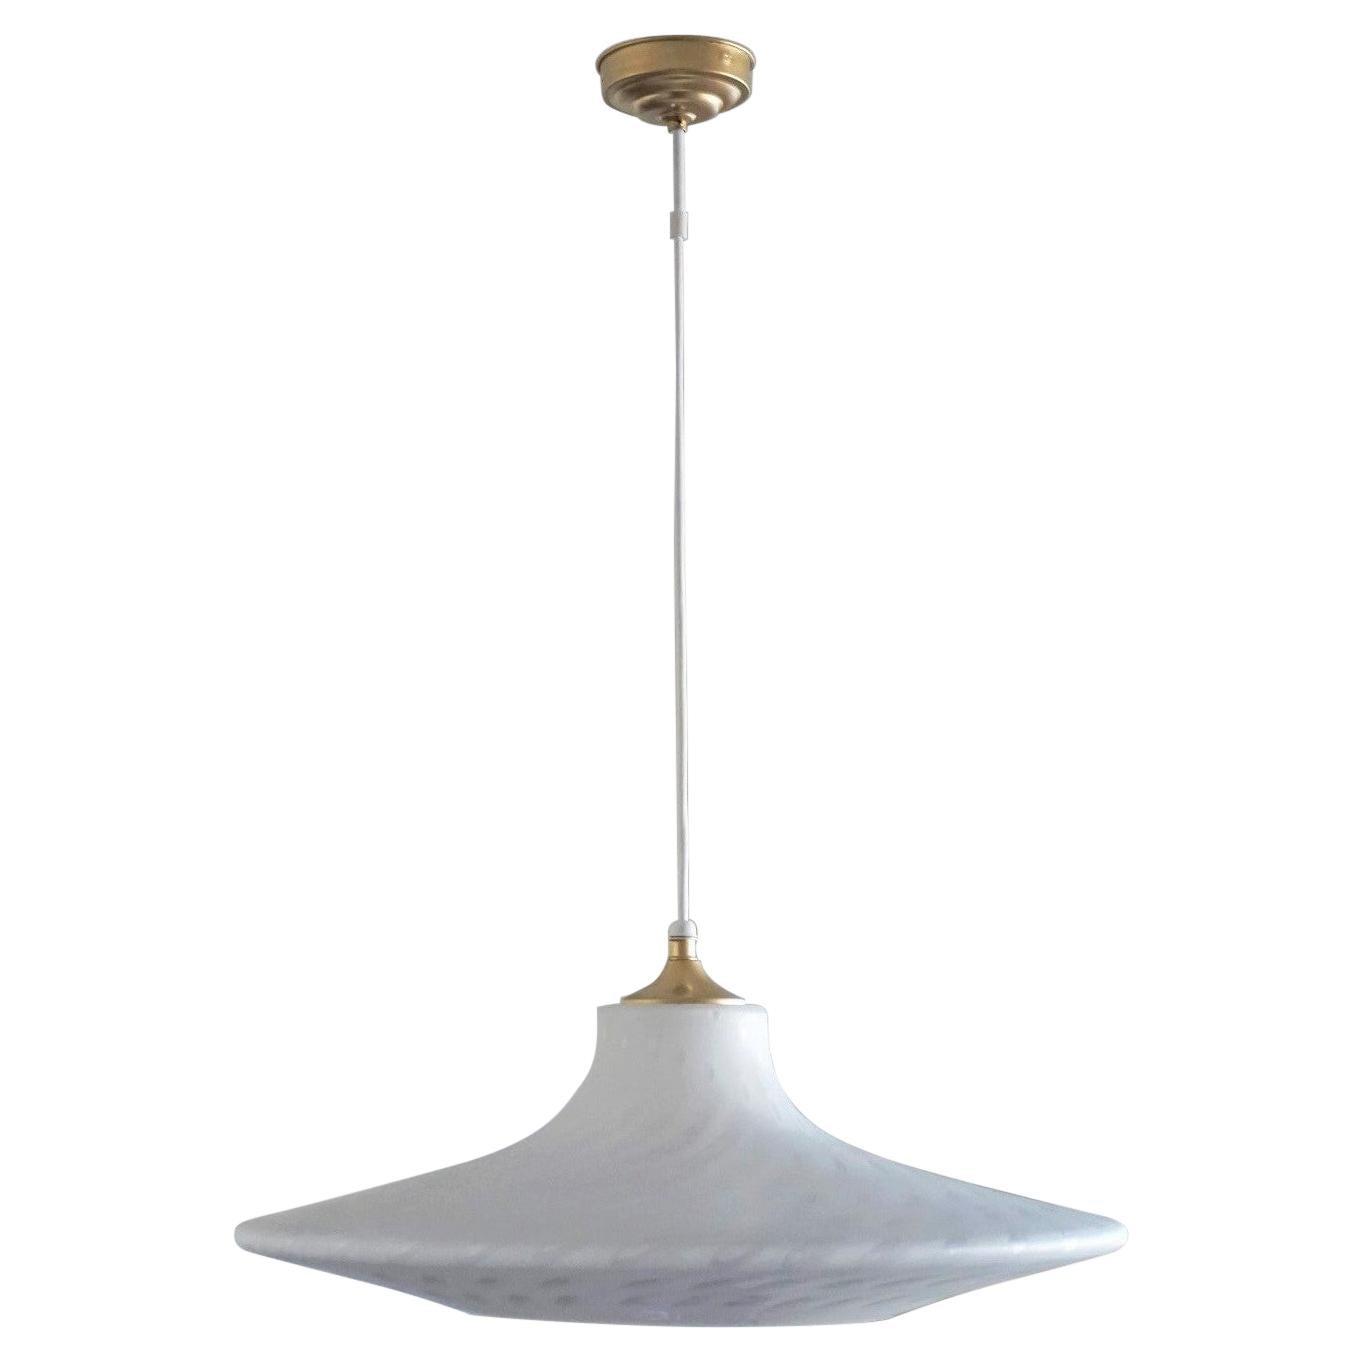 Large 1960s Peill & Putzler Murano Glass Pendant or Fluch Mount Stilnovo Style